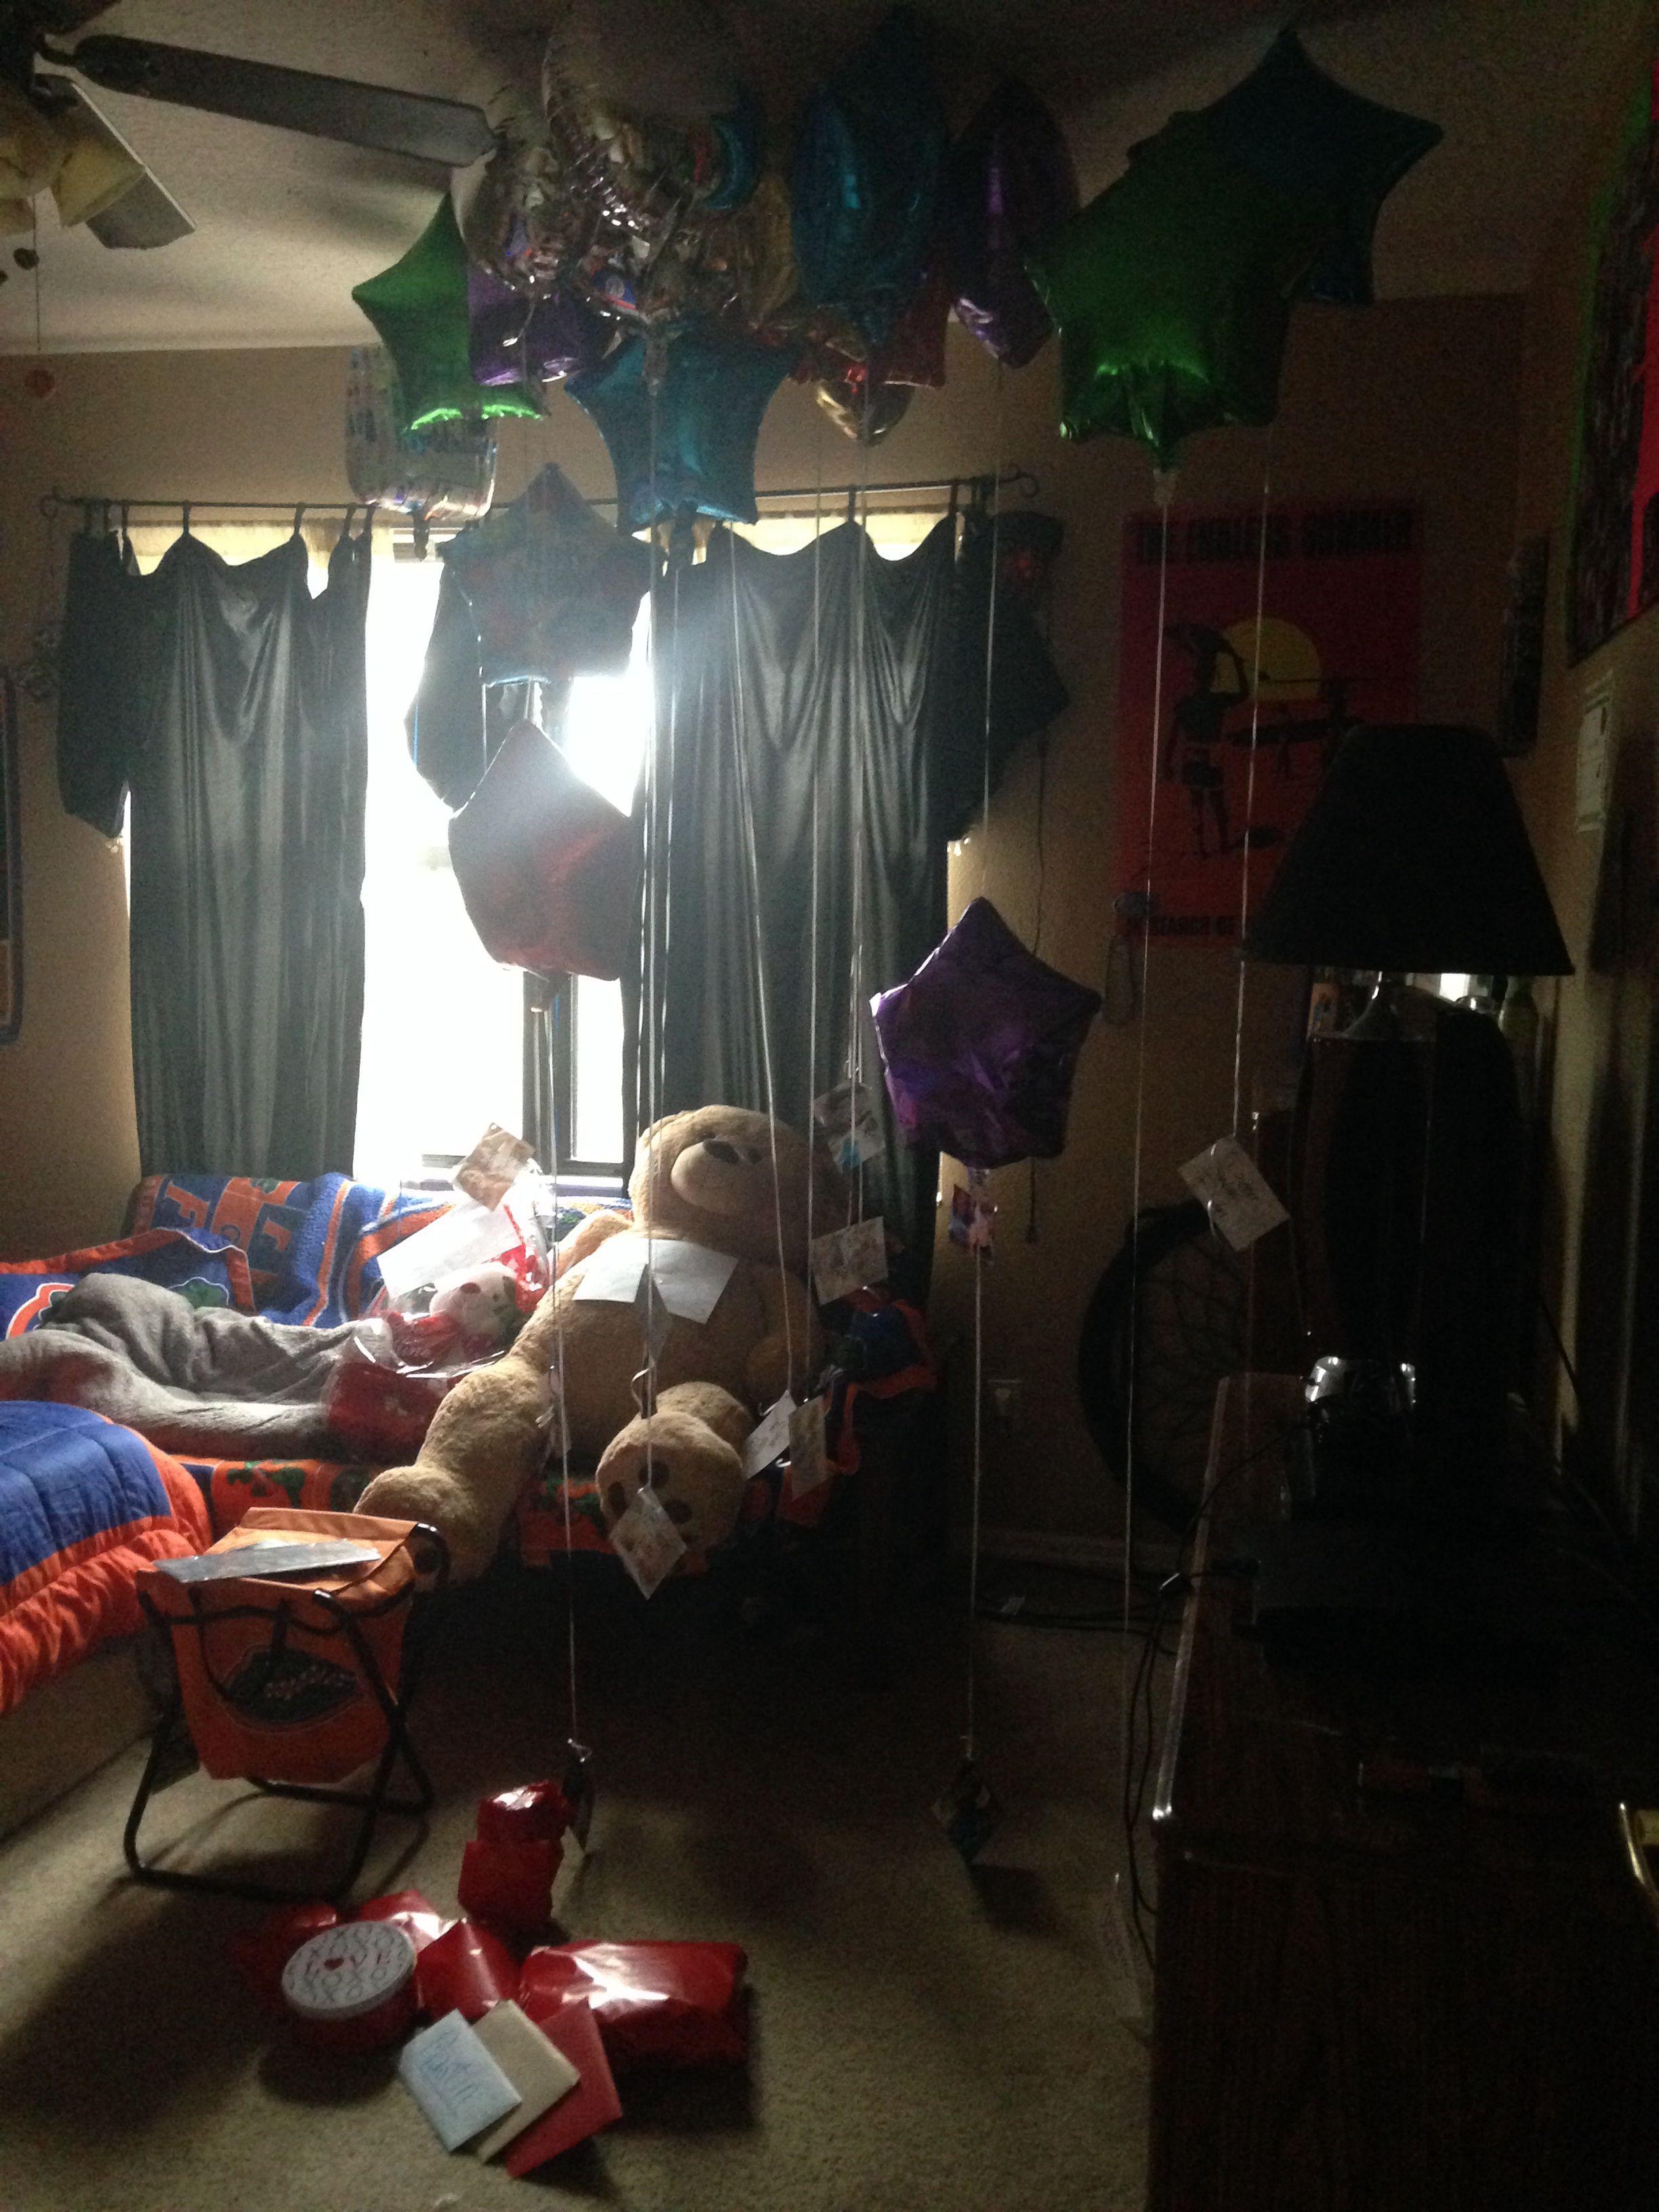 My Boyfriends 19th Birthday Surprise 19balloons Presents Pictures Valentines